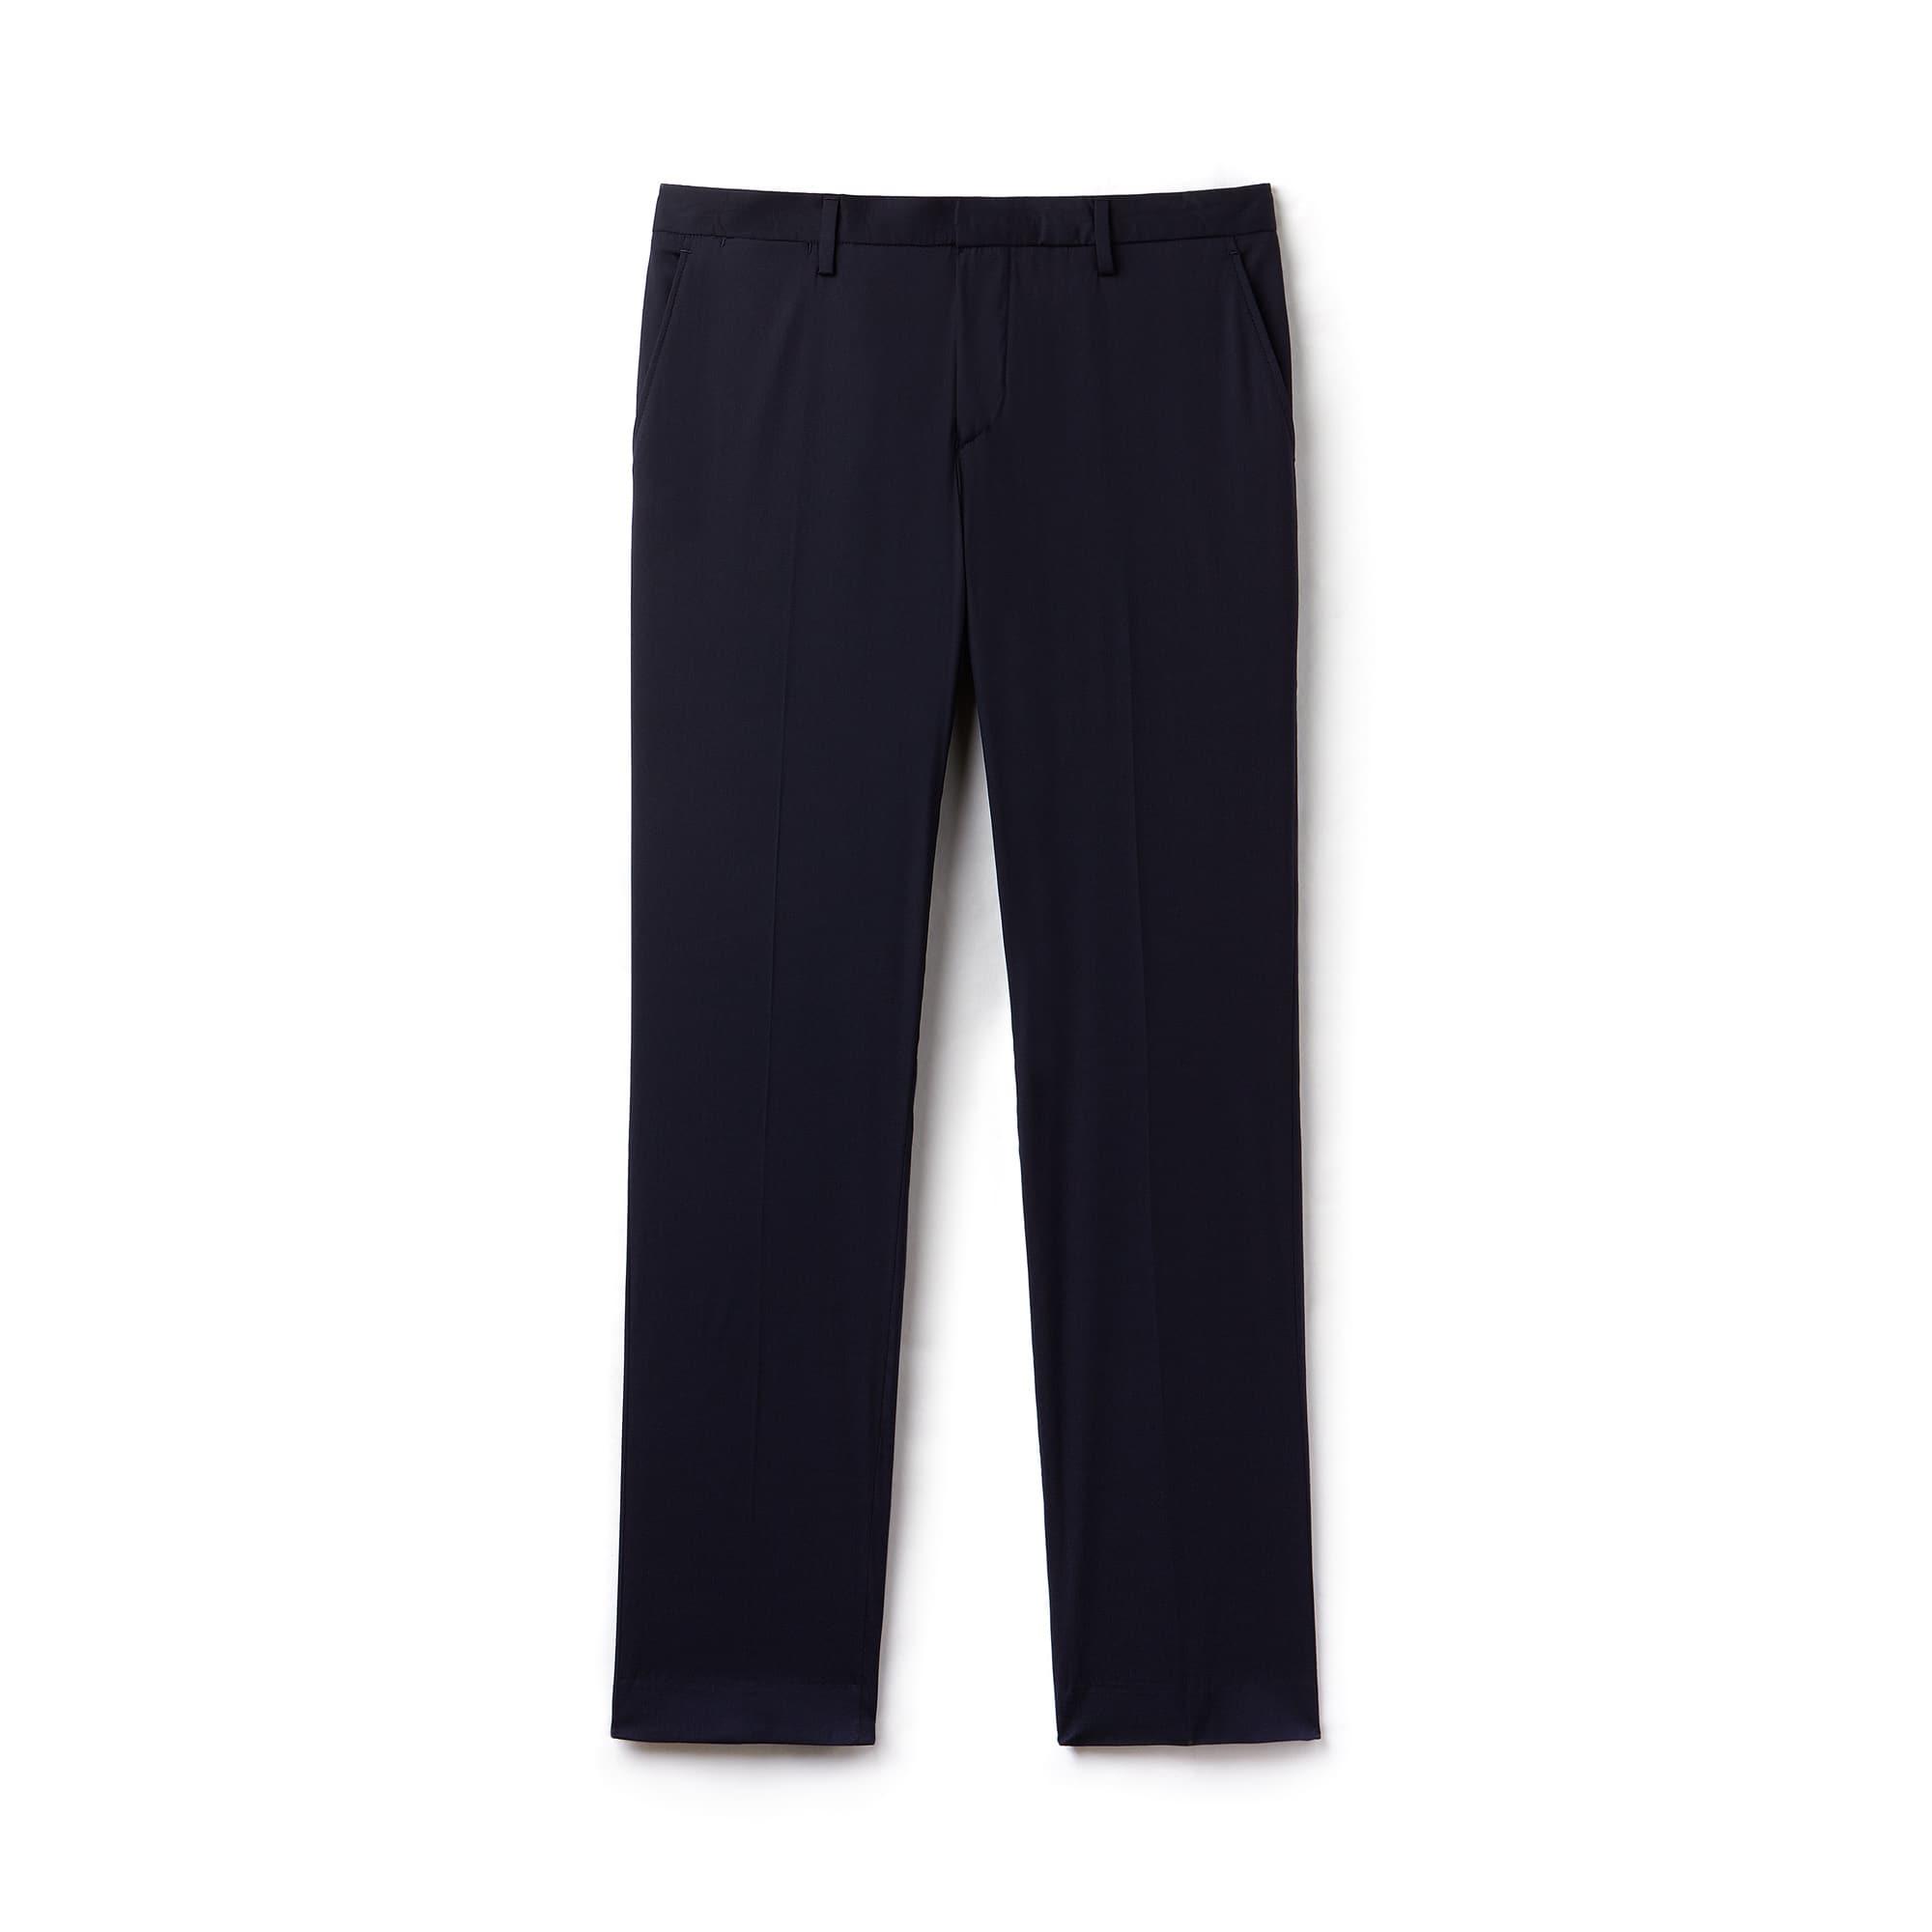 Men's Lacoste MOTION Regular Fit Poplin Pleated Chino Pants